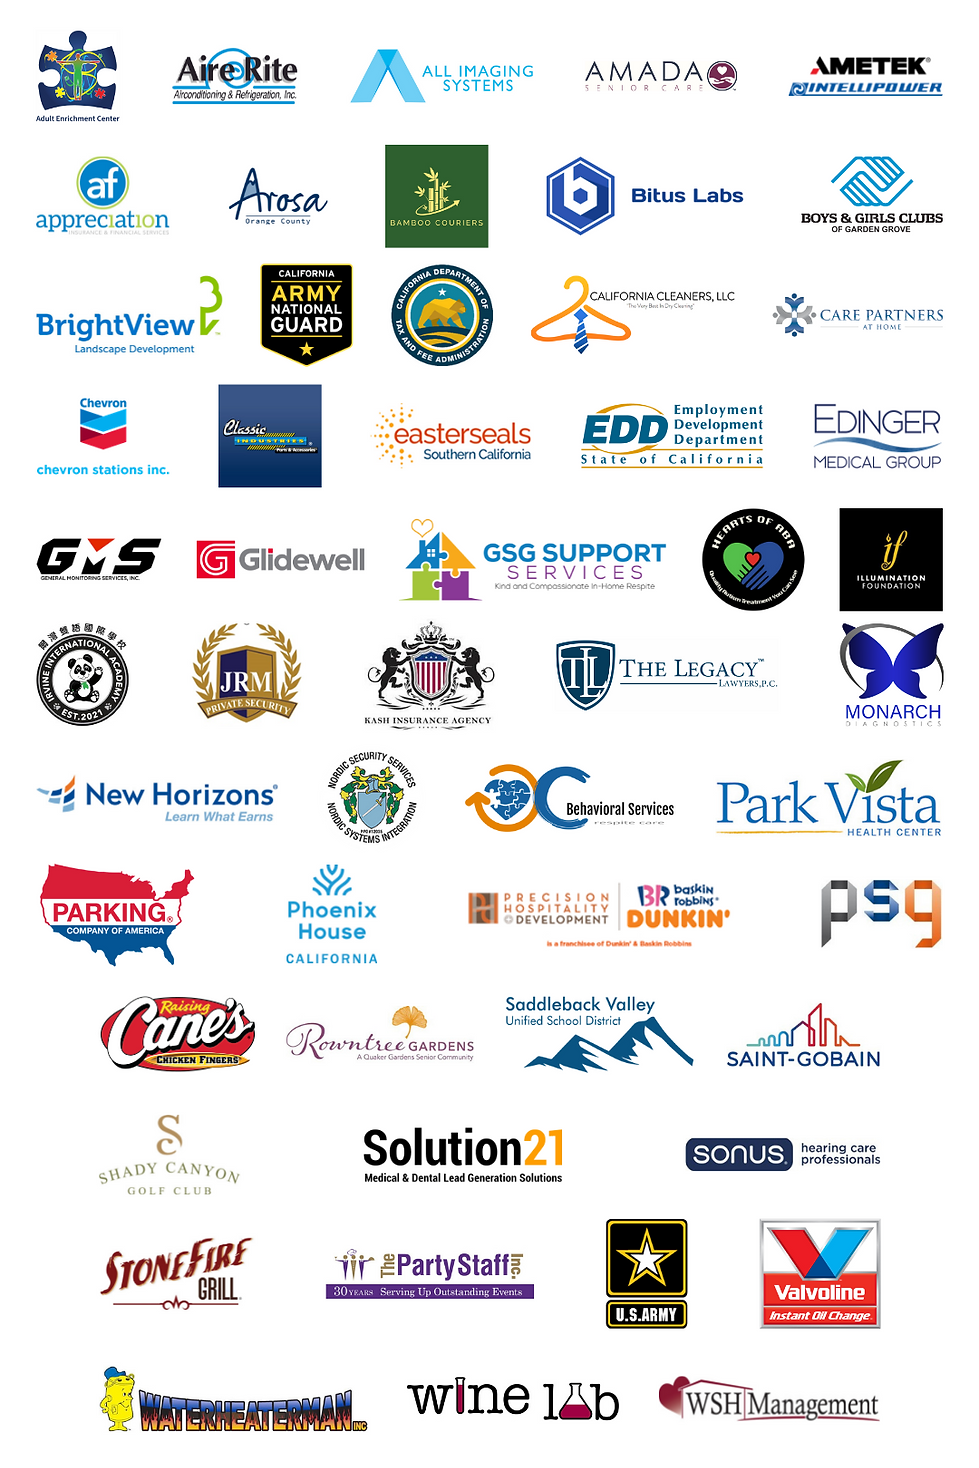 OC 3rd District Job Fair_Employer Logos (1080px x 1620px)_09212021.png